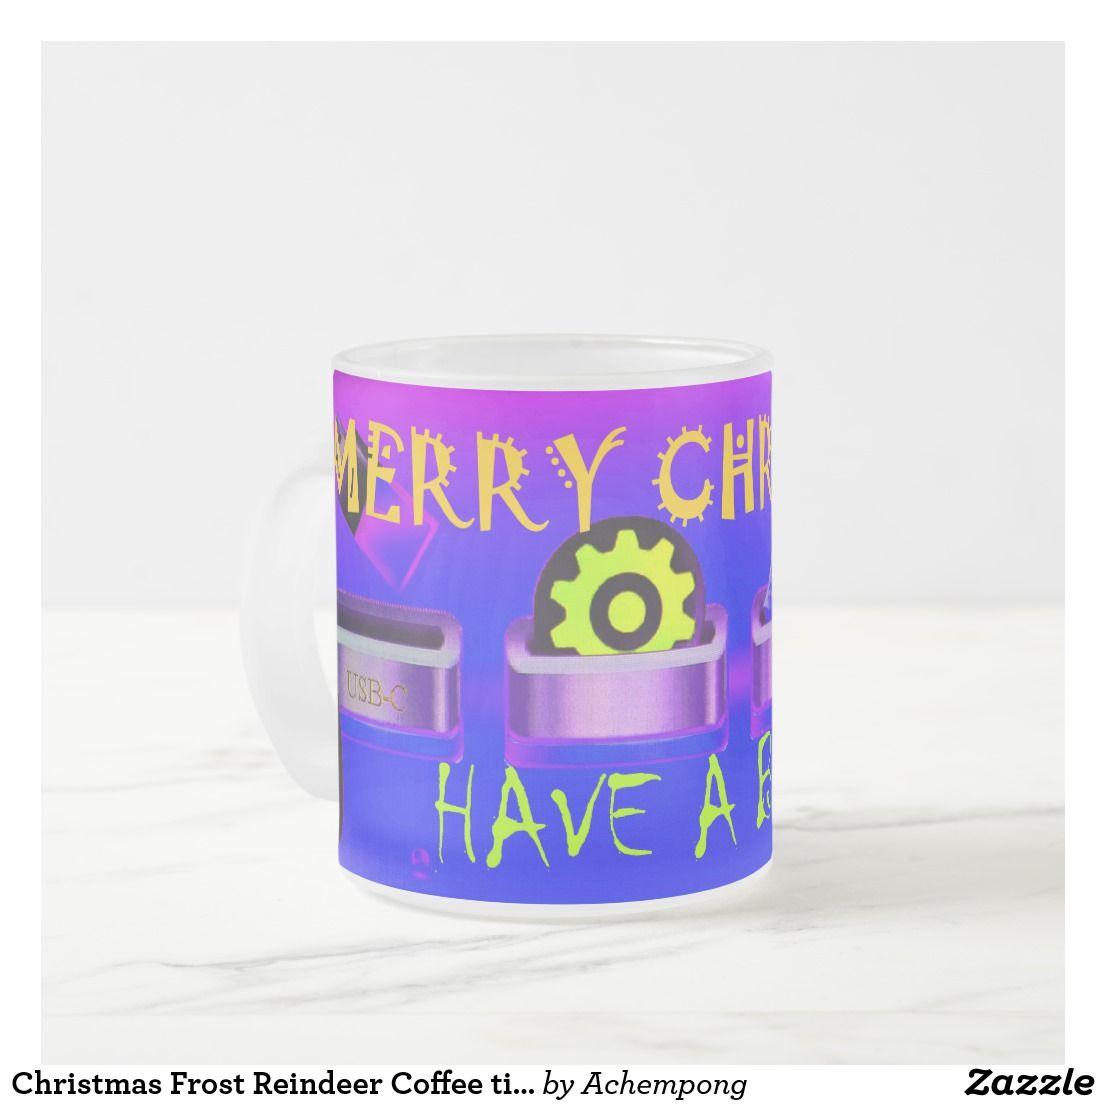 Christmas Frost Reindeer Coffee Time Frosted Glass Coffee Mug Zazzle Co Uk Glass Coffee Mugs Mugs Coffee Mugs